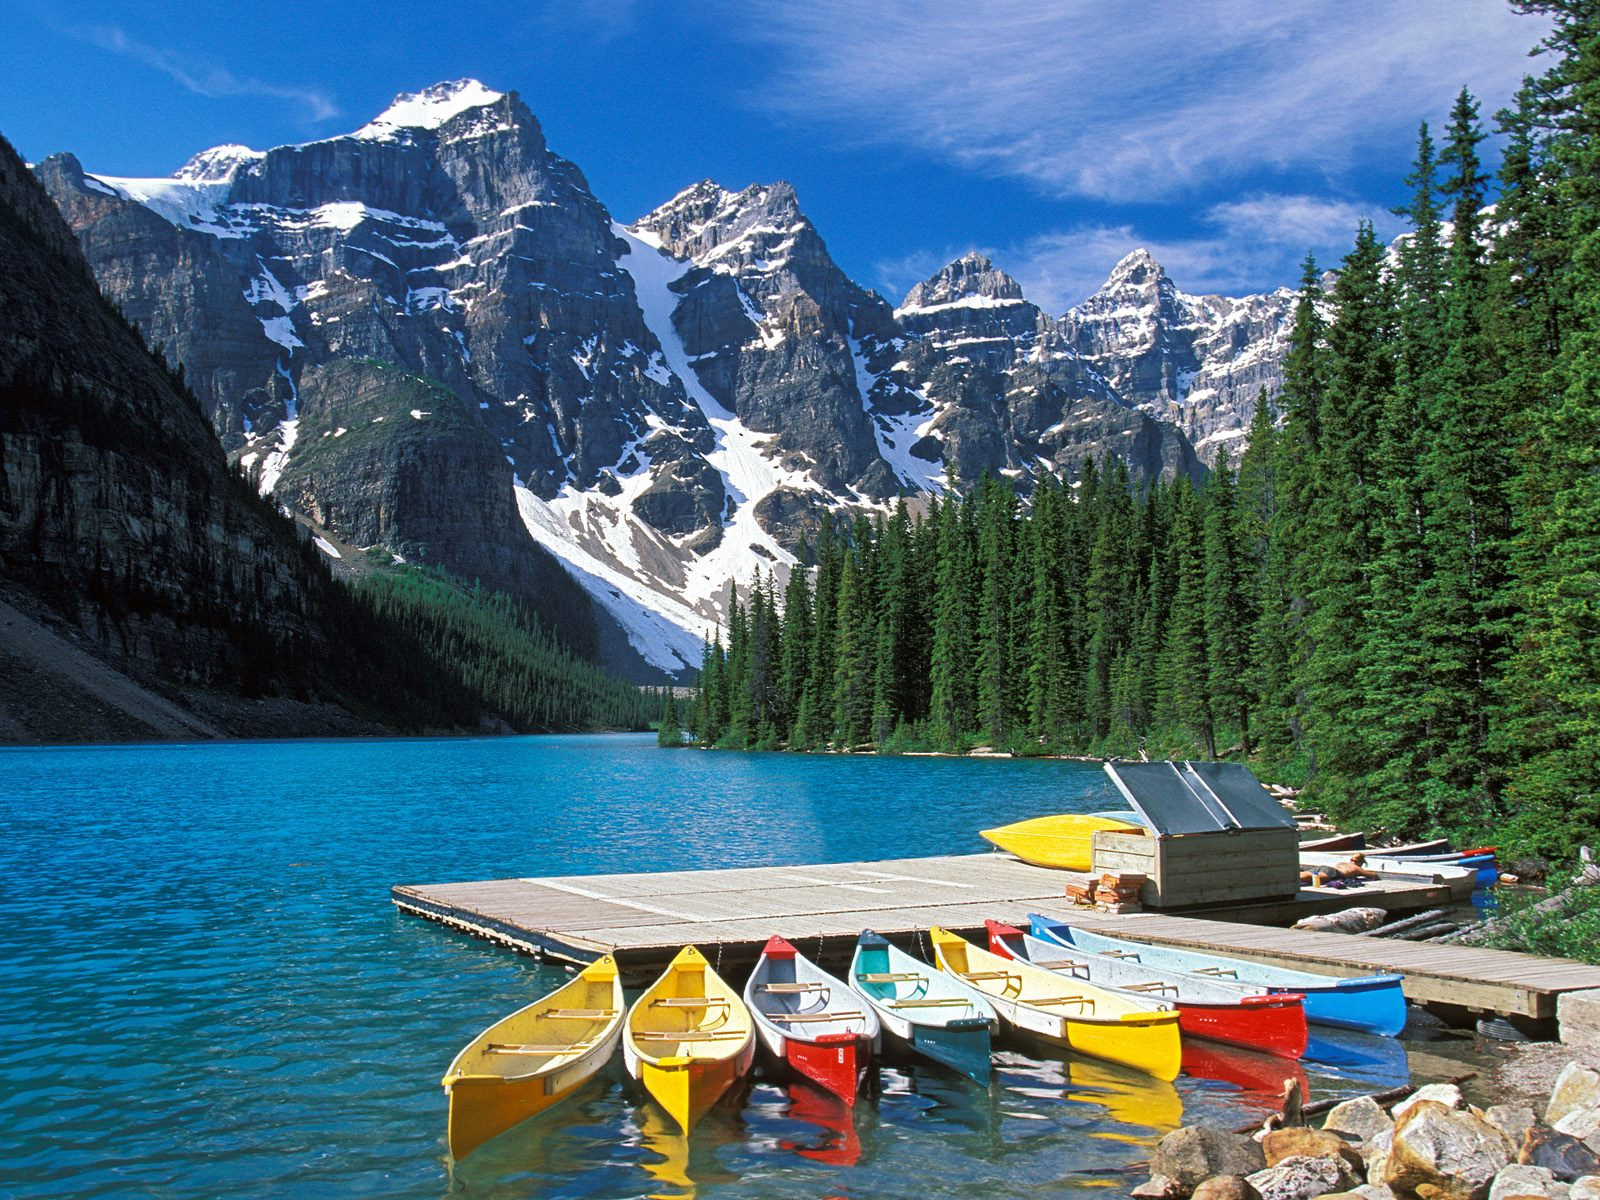 Moraine Lake Banff National Park Canada wallpaper Moraine Lake 1600x1200